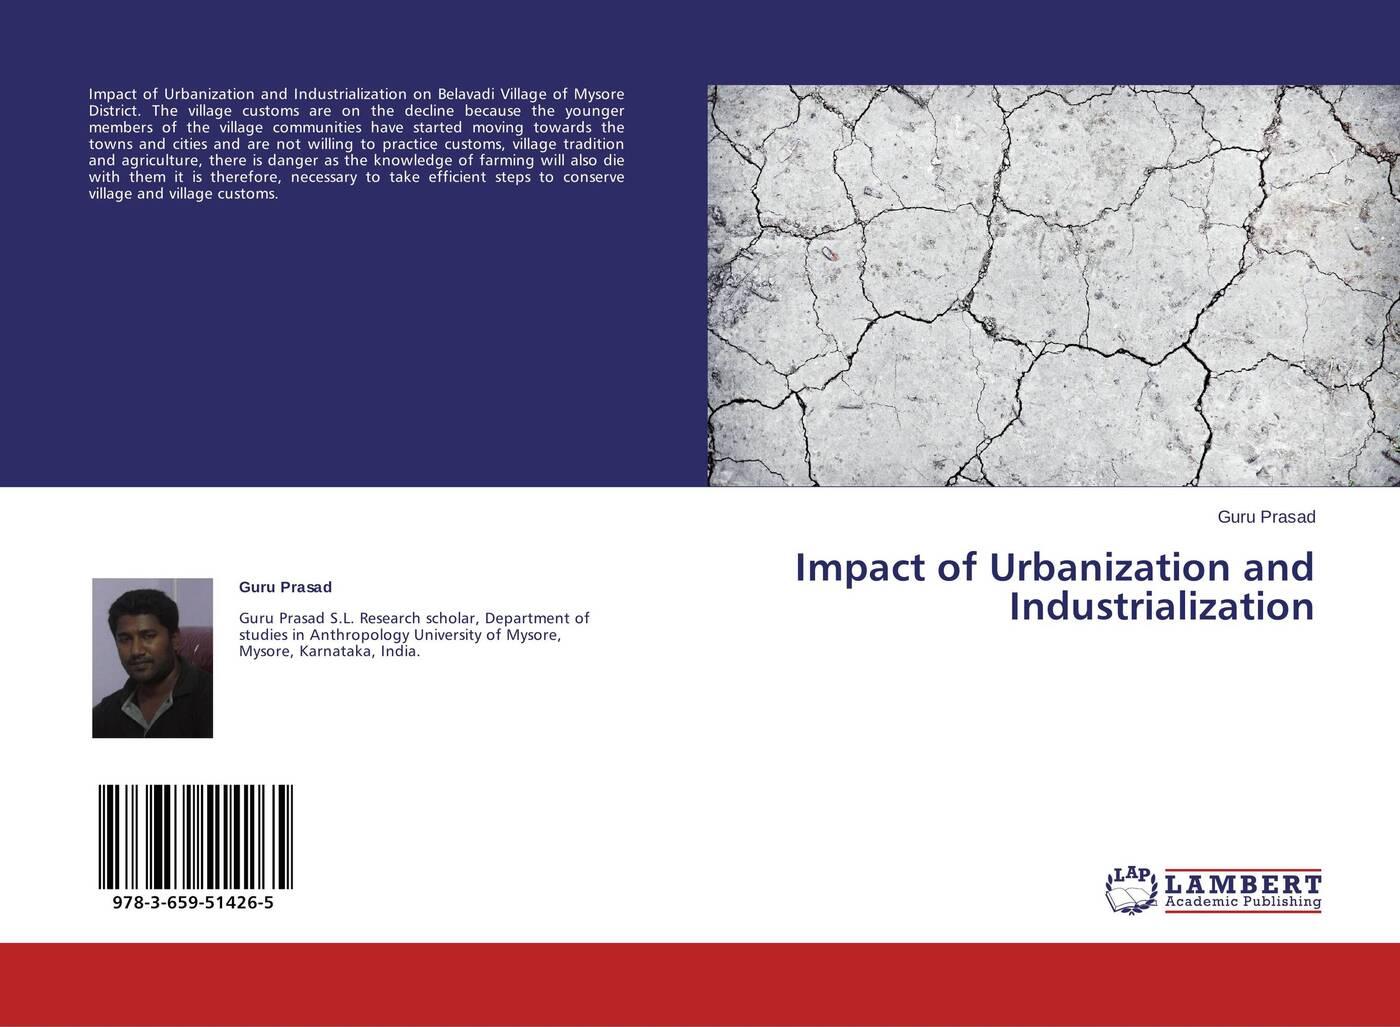 Guru Prasad Impact of Urbanization and Industrialization william e arnal jesus and the village scribes